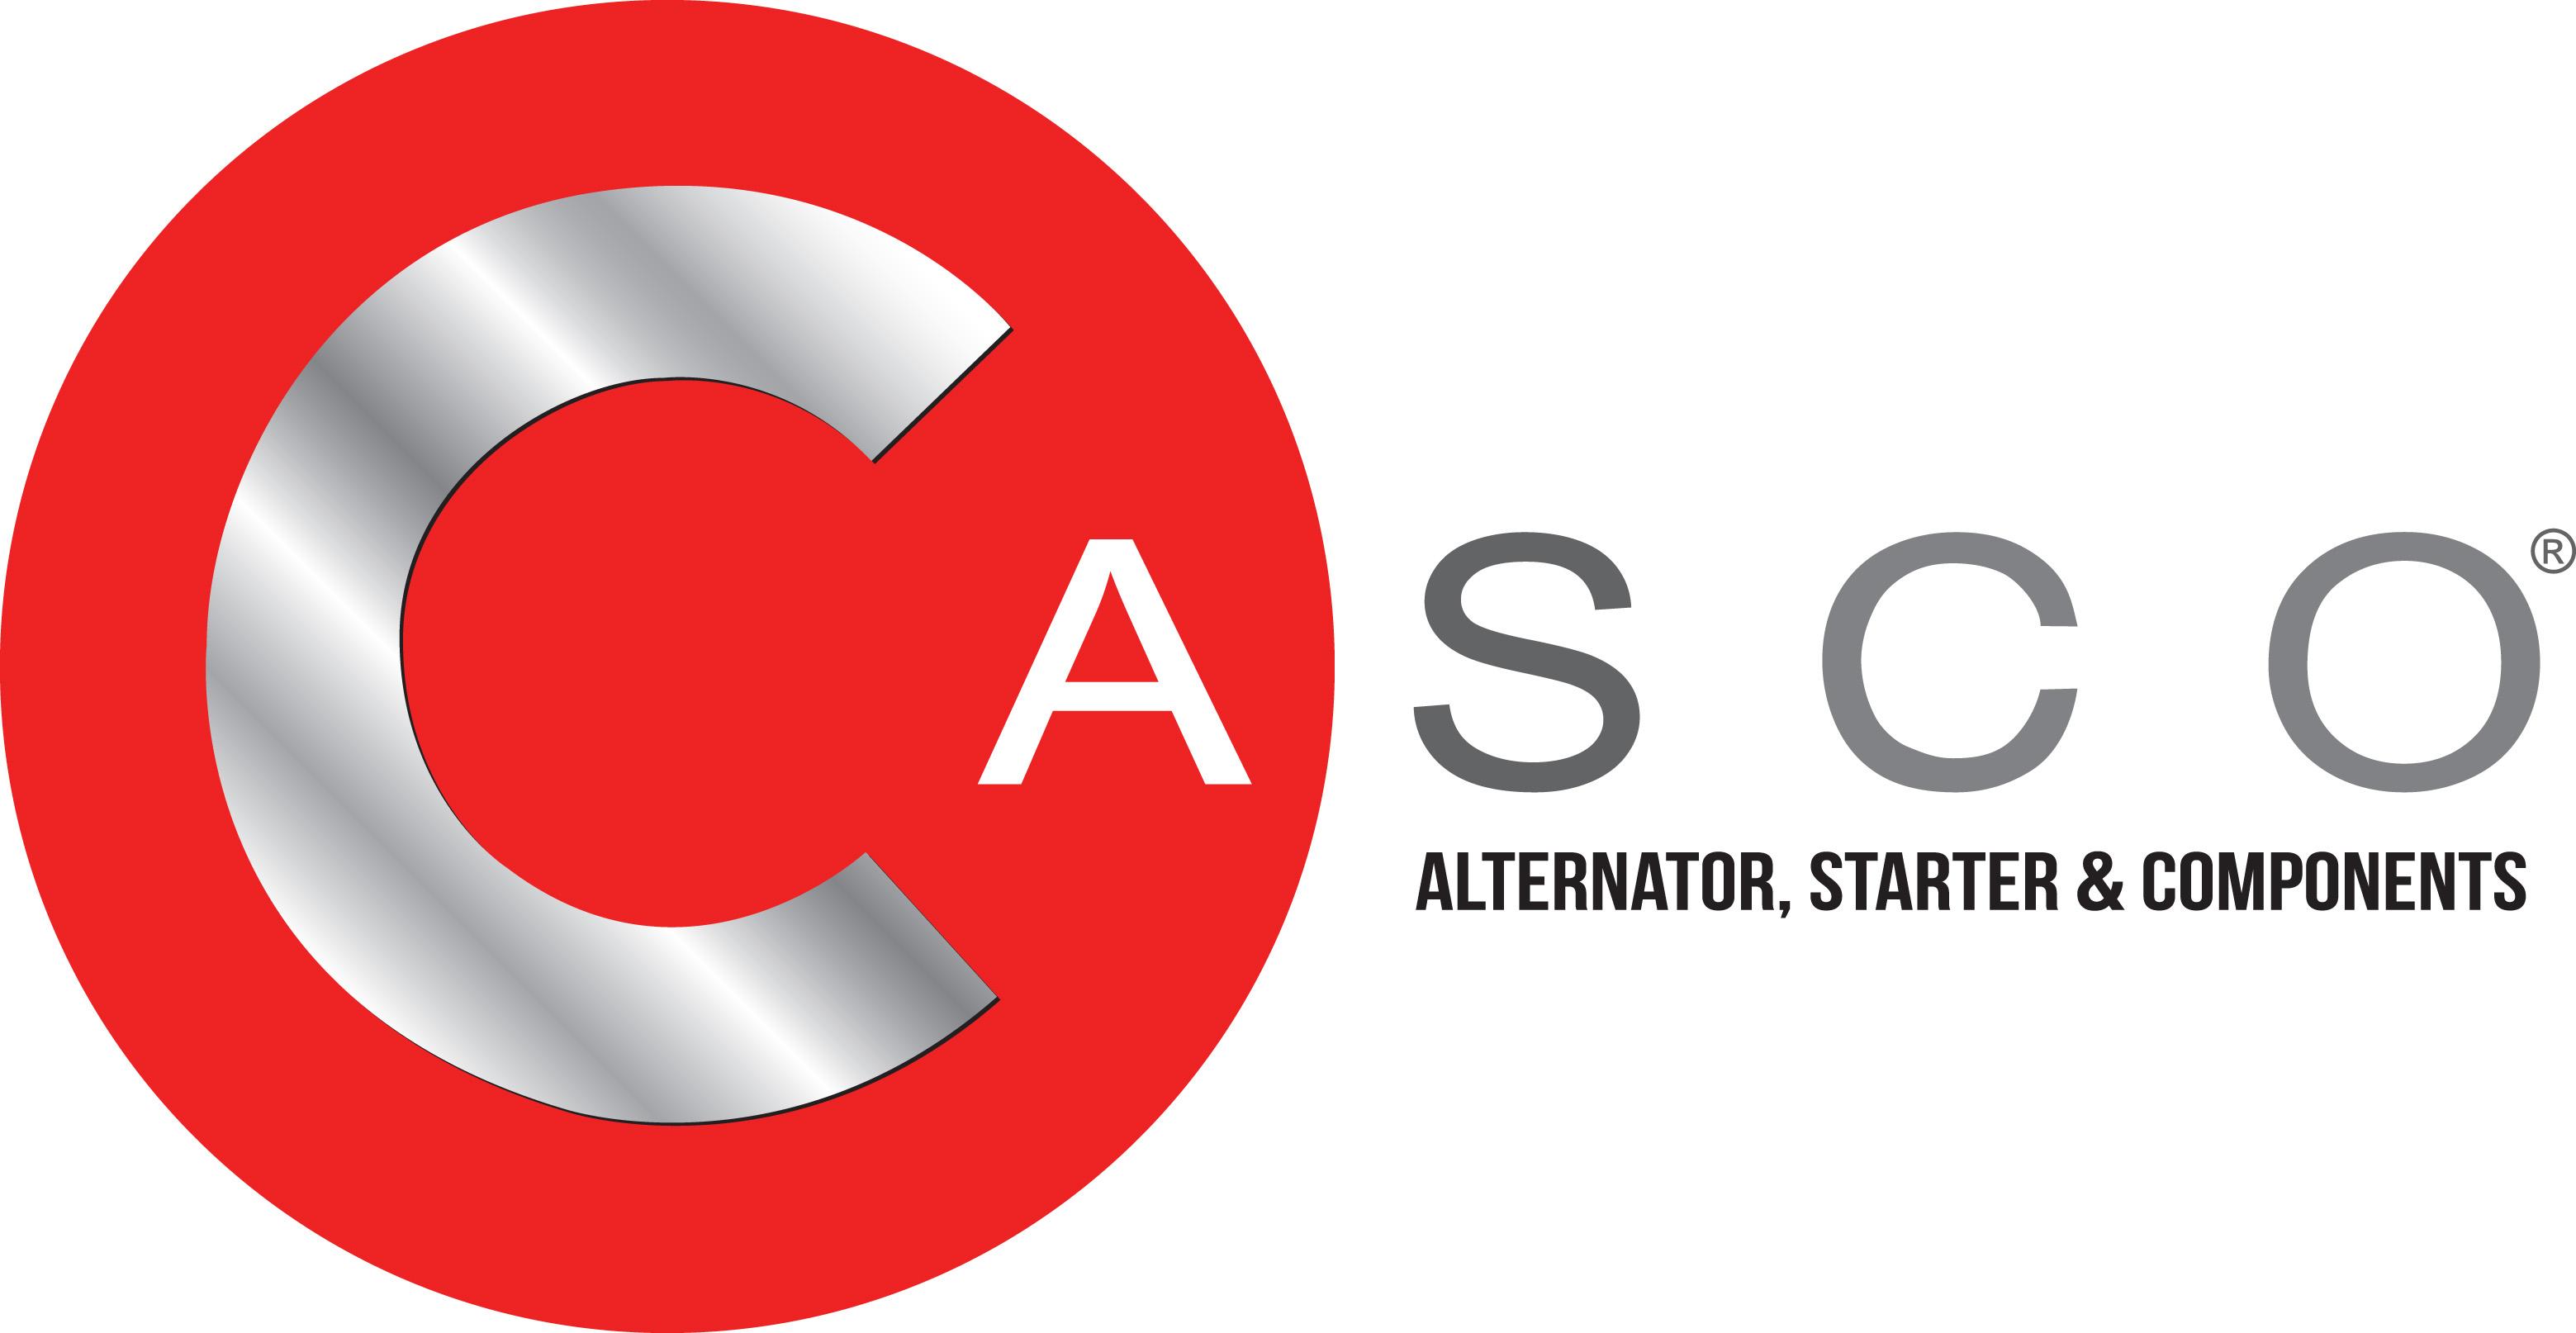 Logo_Casco_CMYK_VETTO